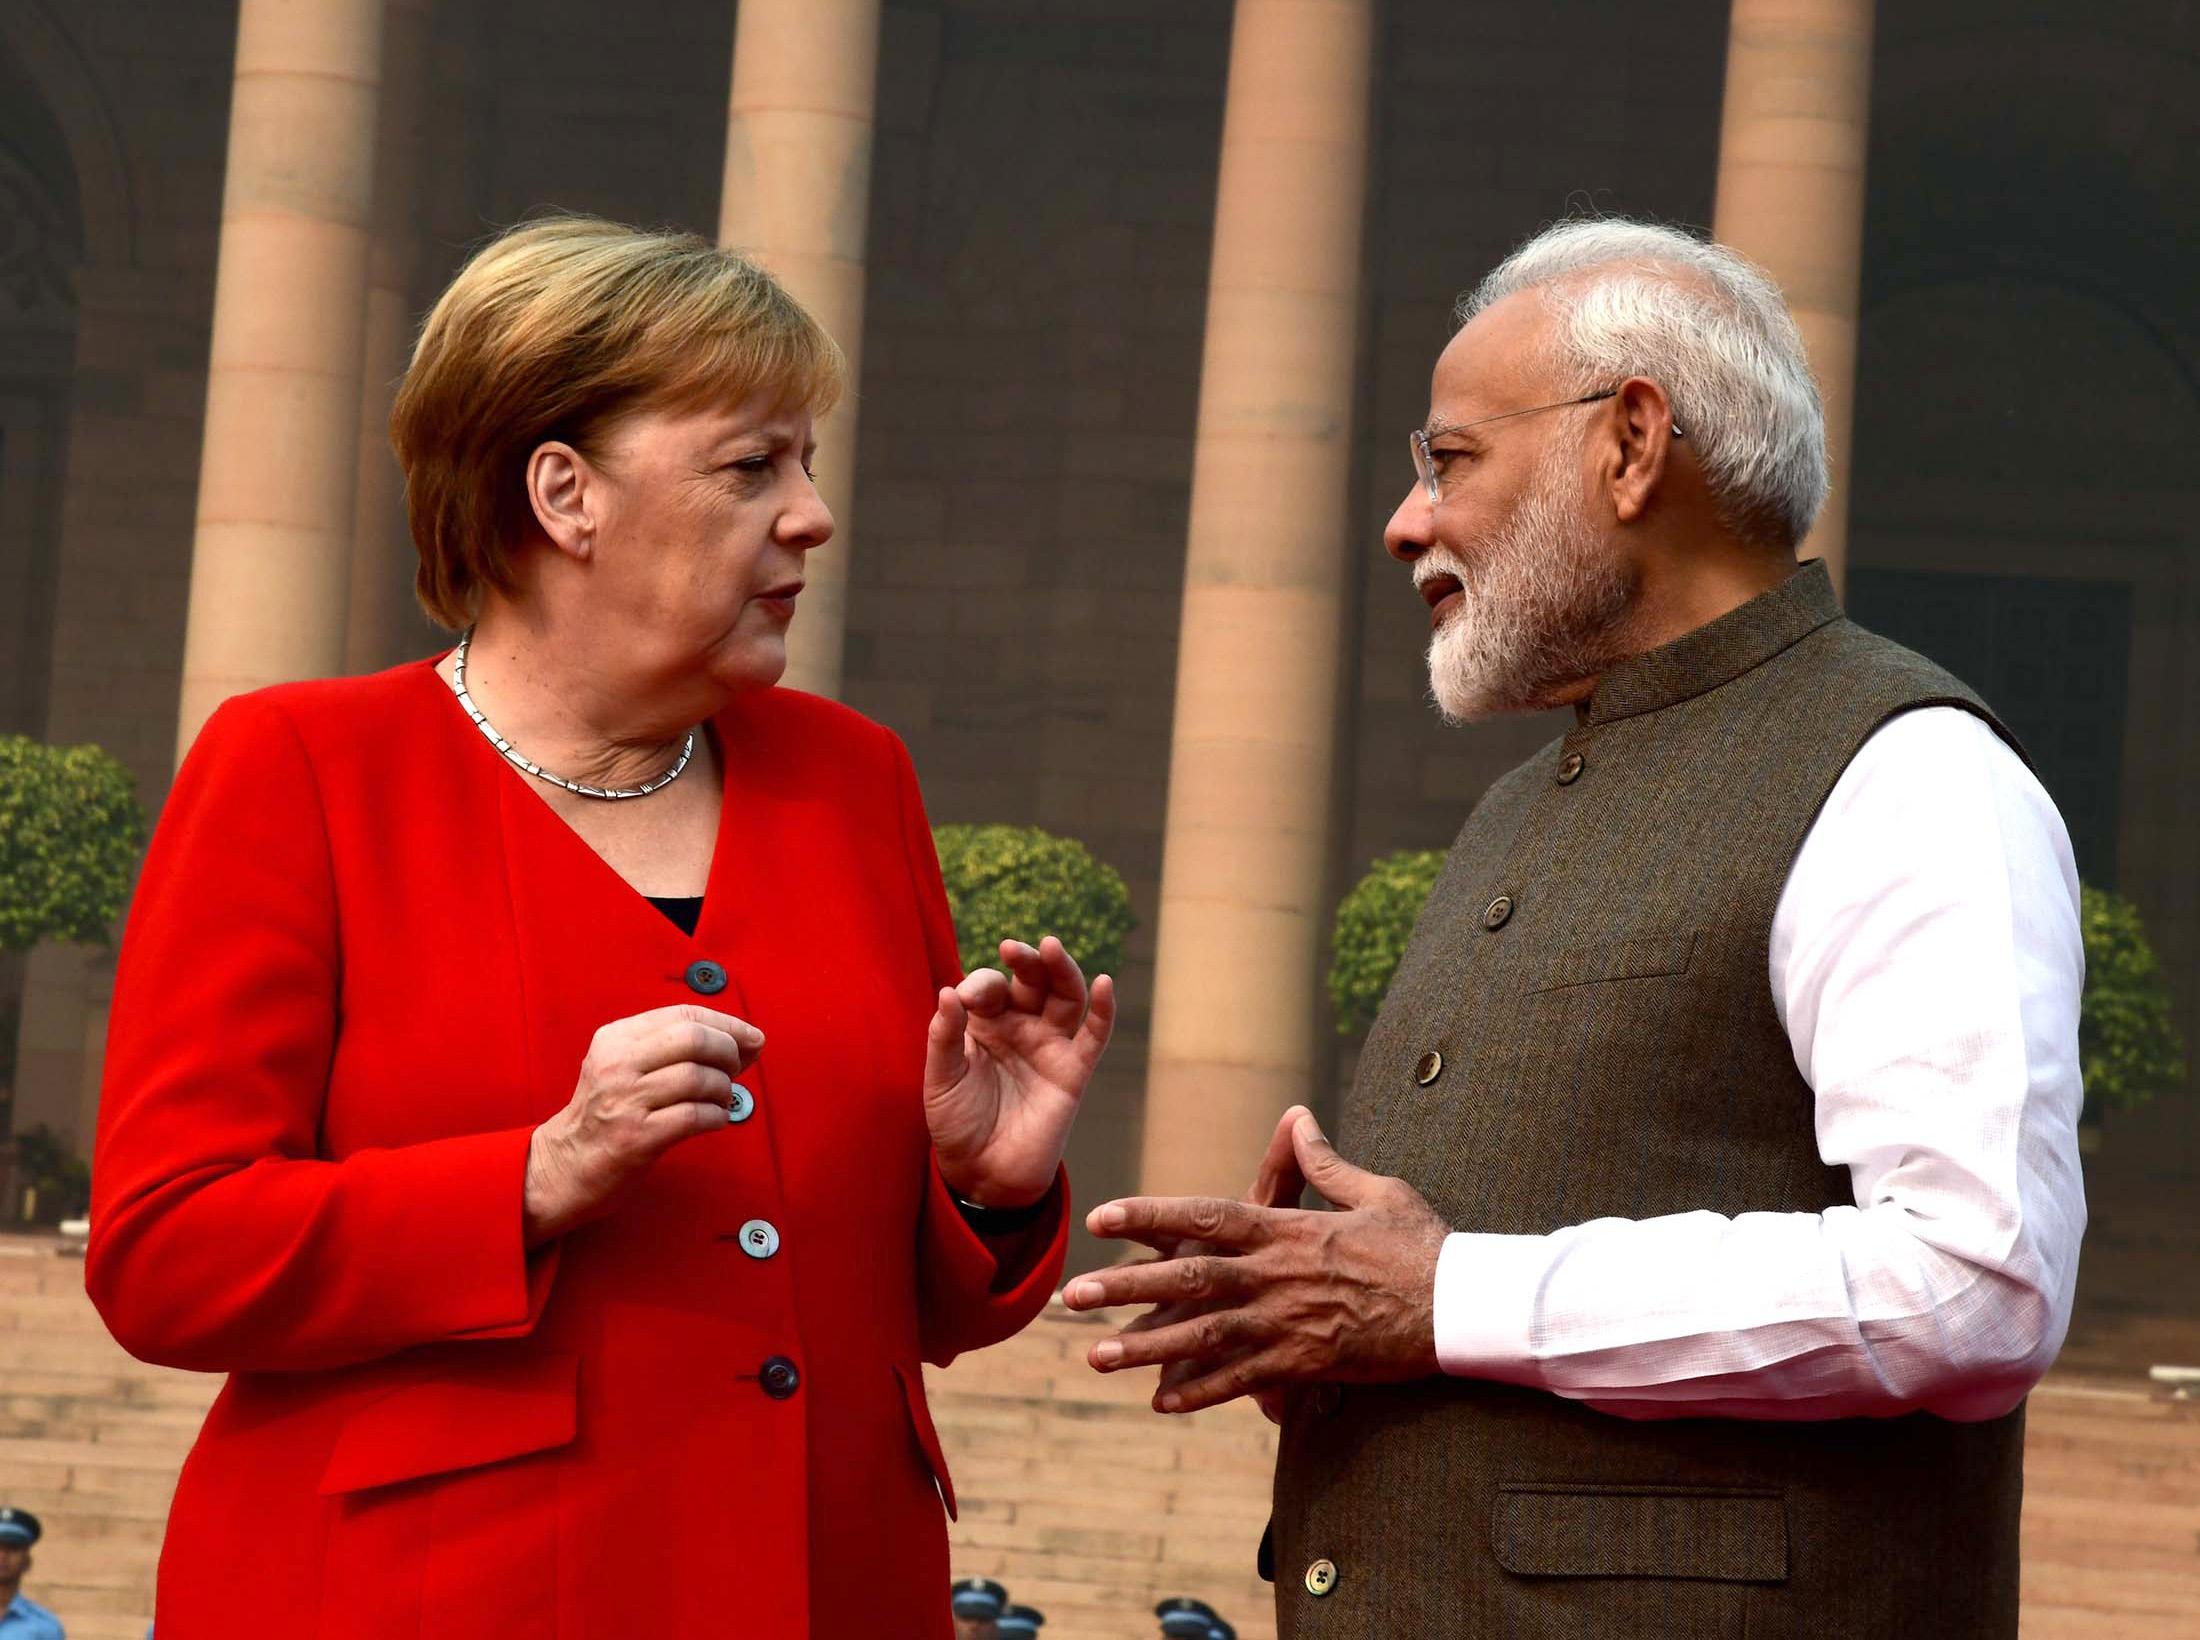 Kashmir situation 'not sustainable', needs to change, says Angela Merkel